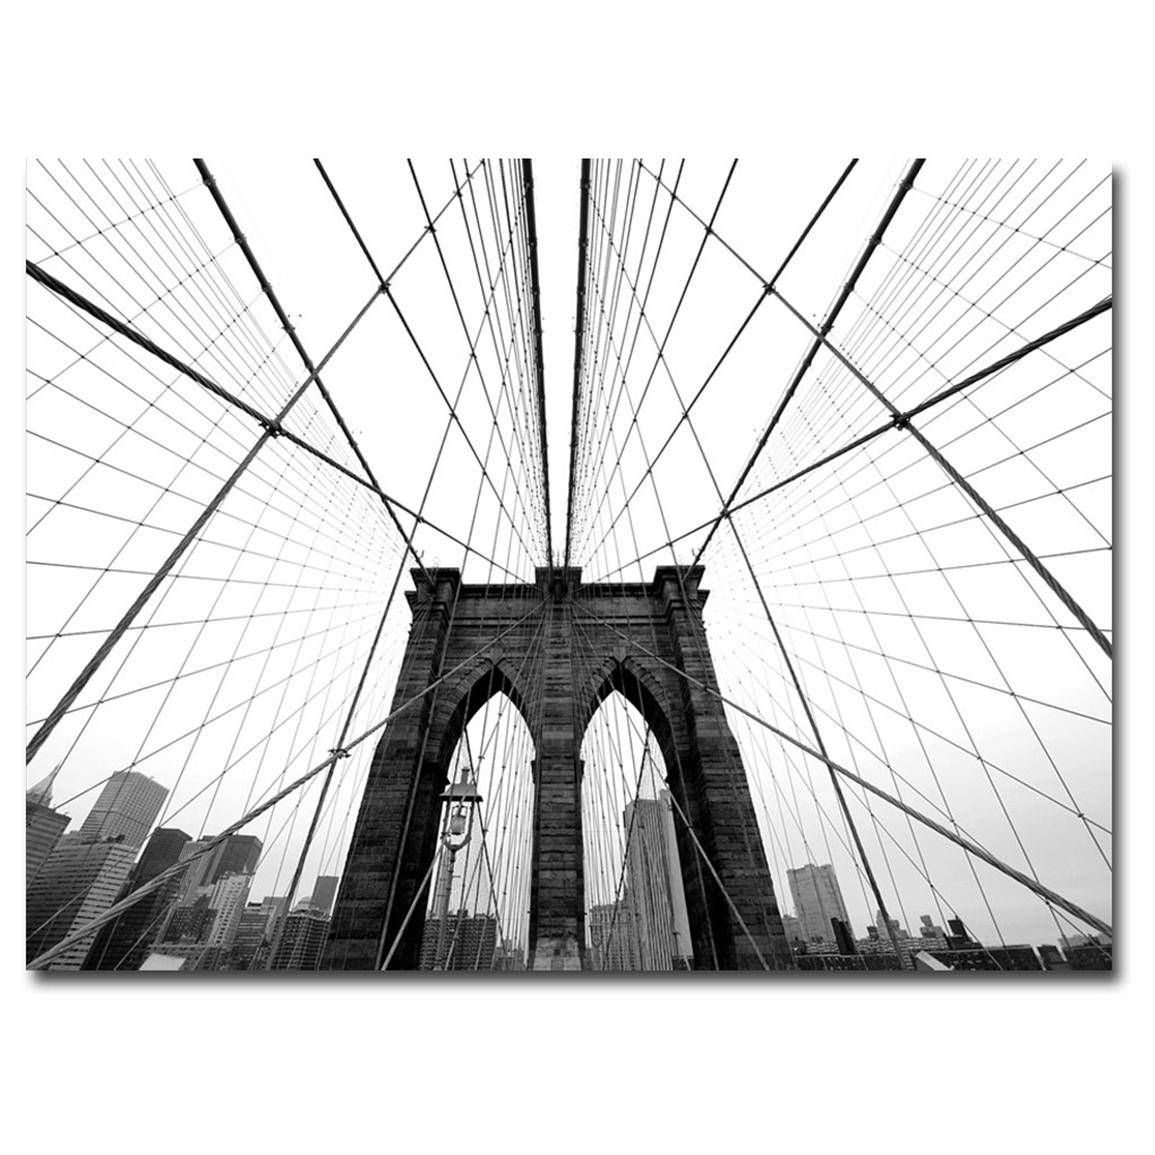 Delightful Ideas Brooklyn Wall Art Wondrous Inspration Nina Regarding Current Brooklyn Bridge Wall Decals (View 22 of 25)